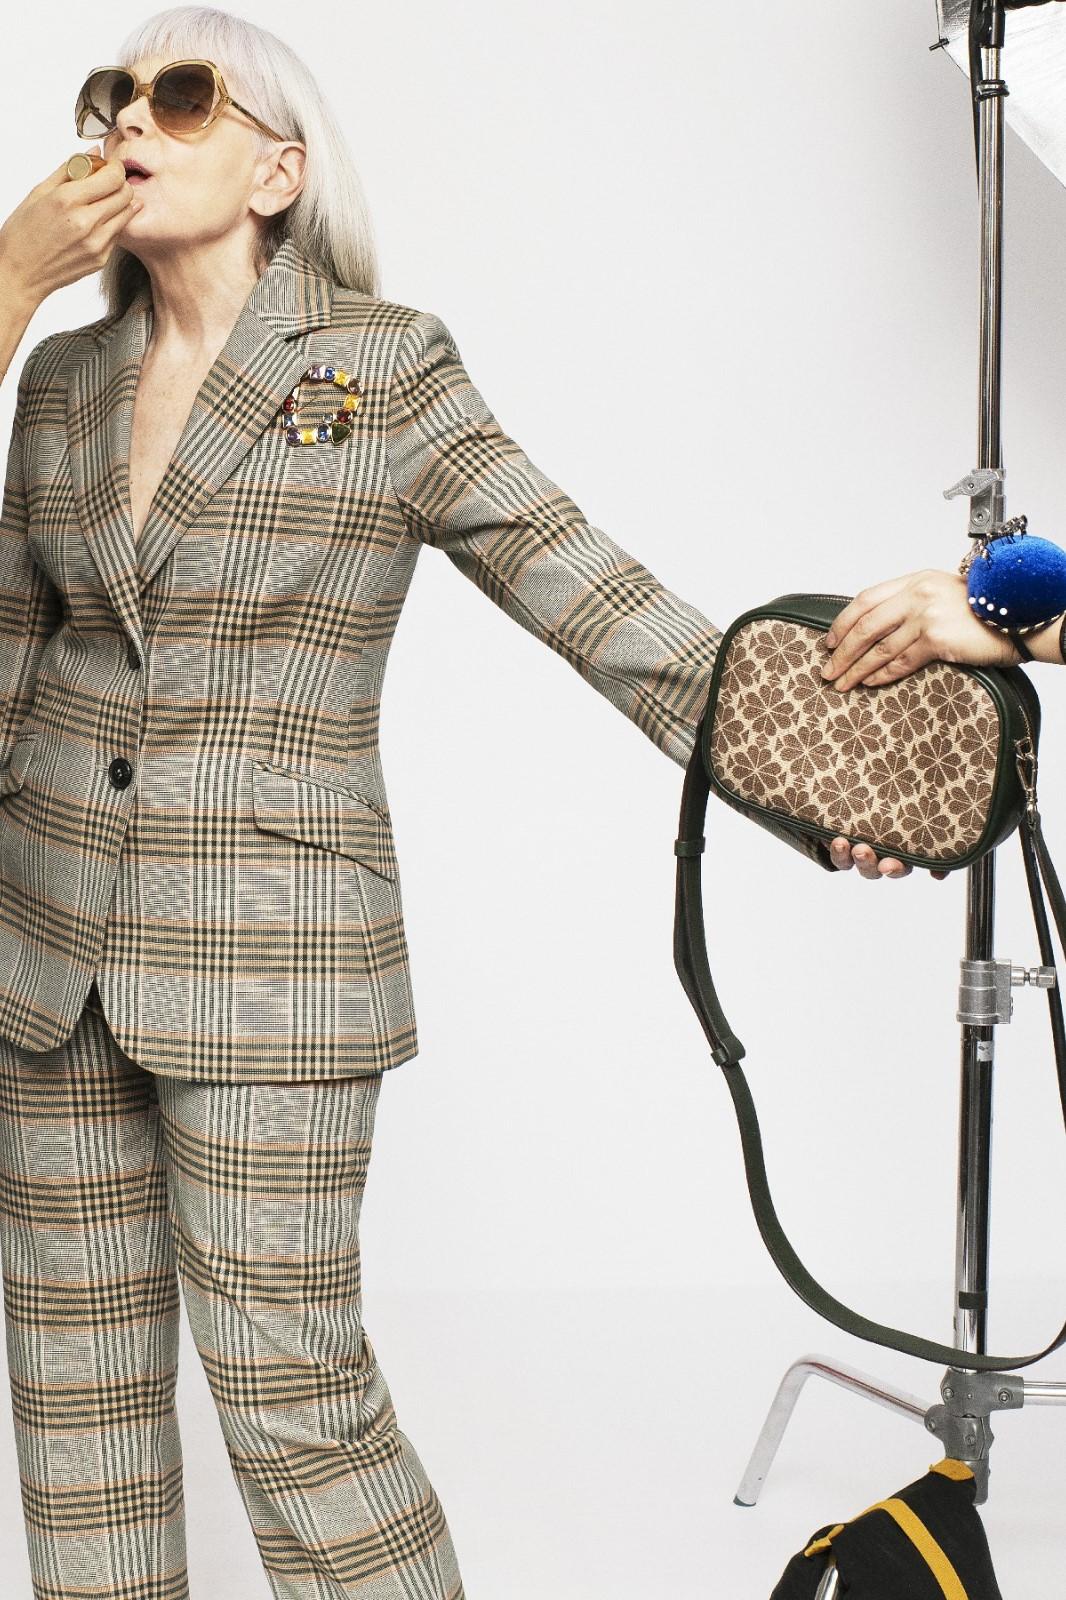 kate spade new york 登陆纽约时装周 2020秋季系列首发 推崇乐观积极的女性态度